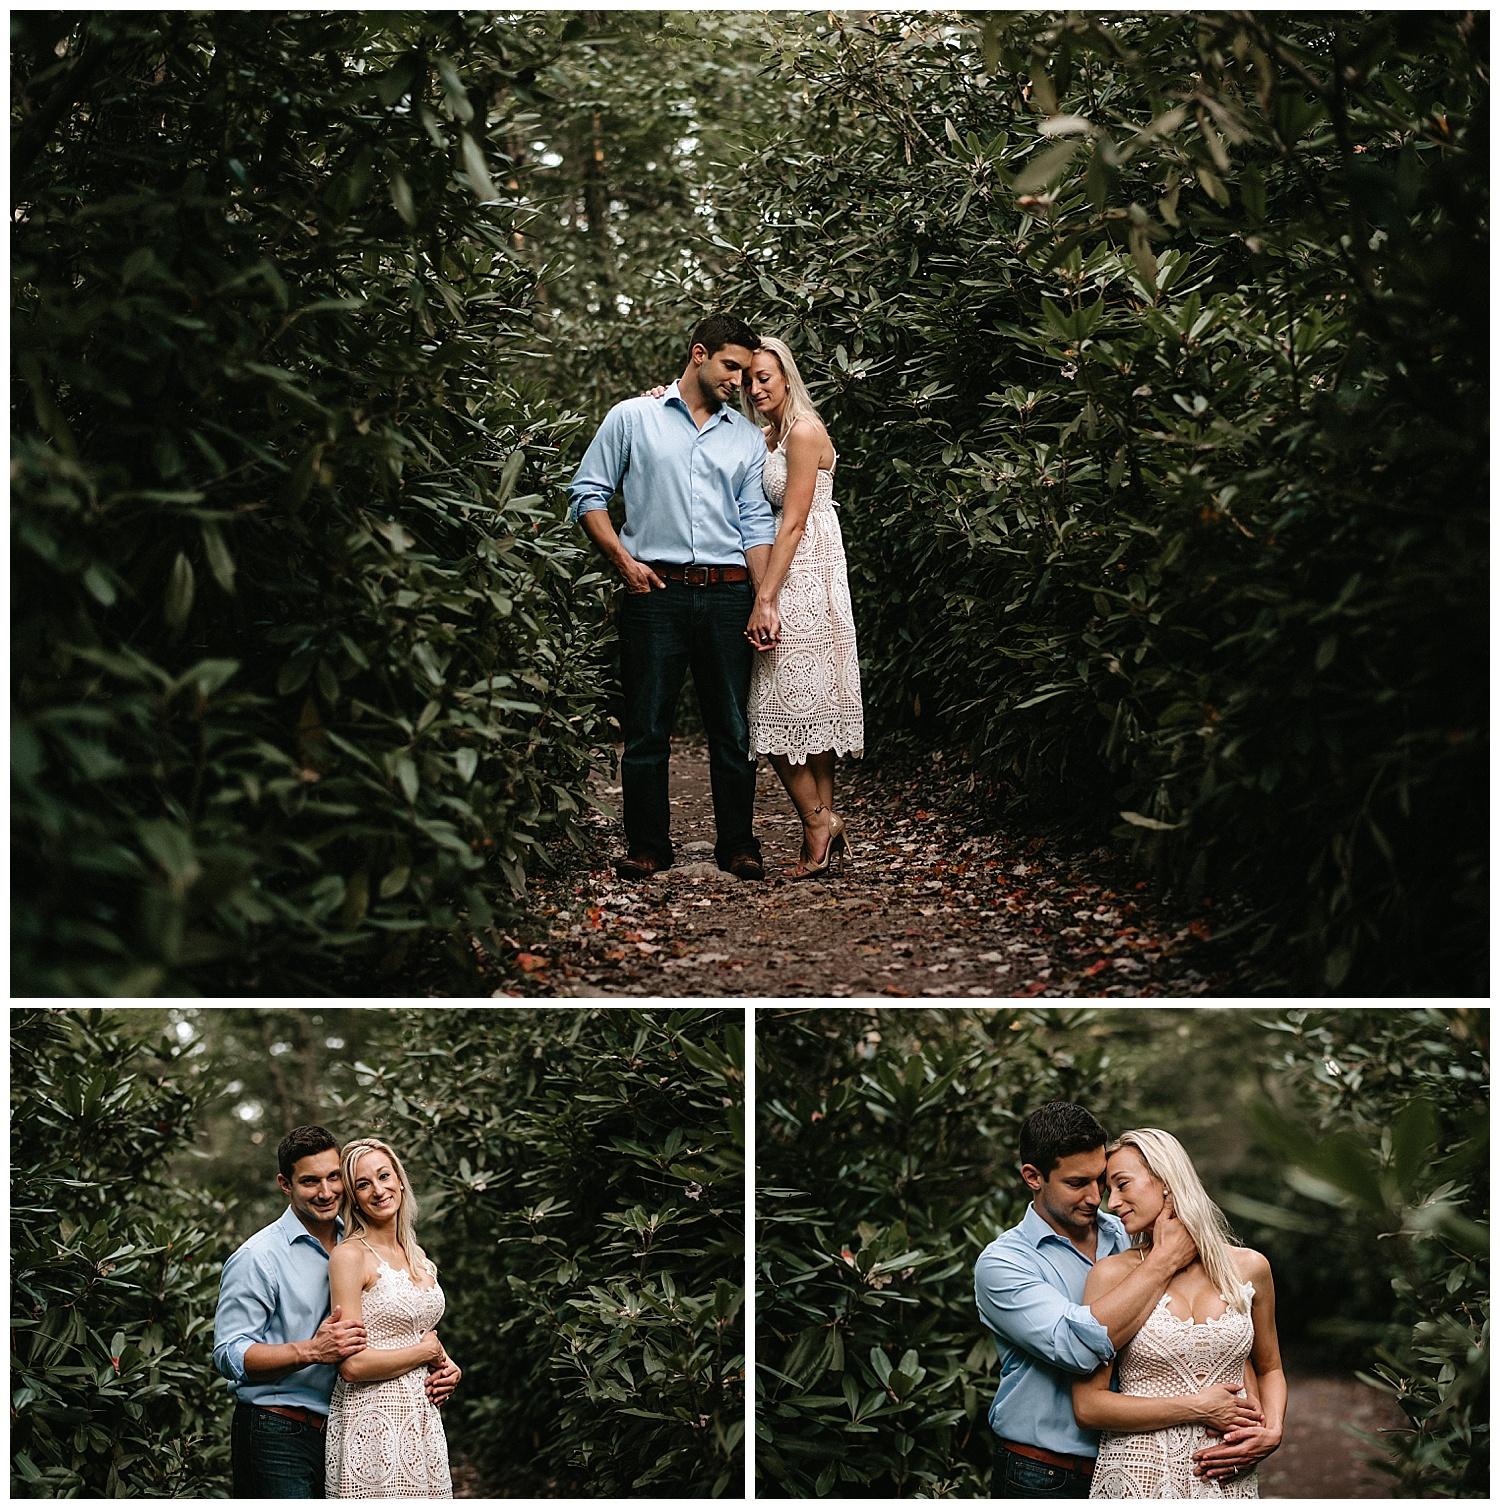 NEPA-Wedding-Engagement-Photographer-at-Hickory-Run-state-park_0019.jpg